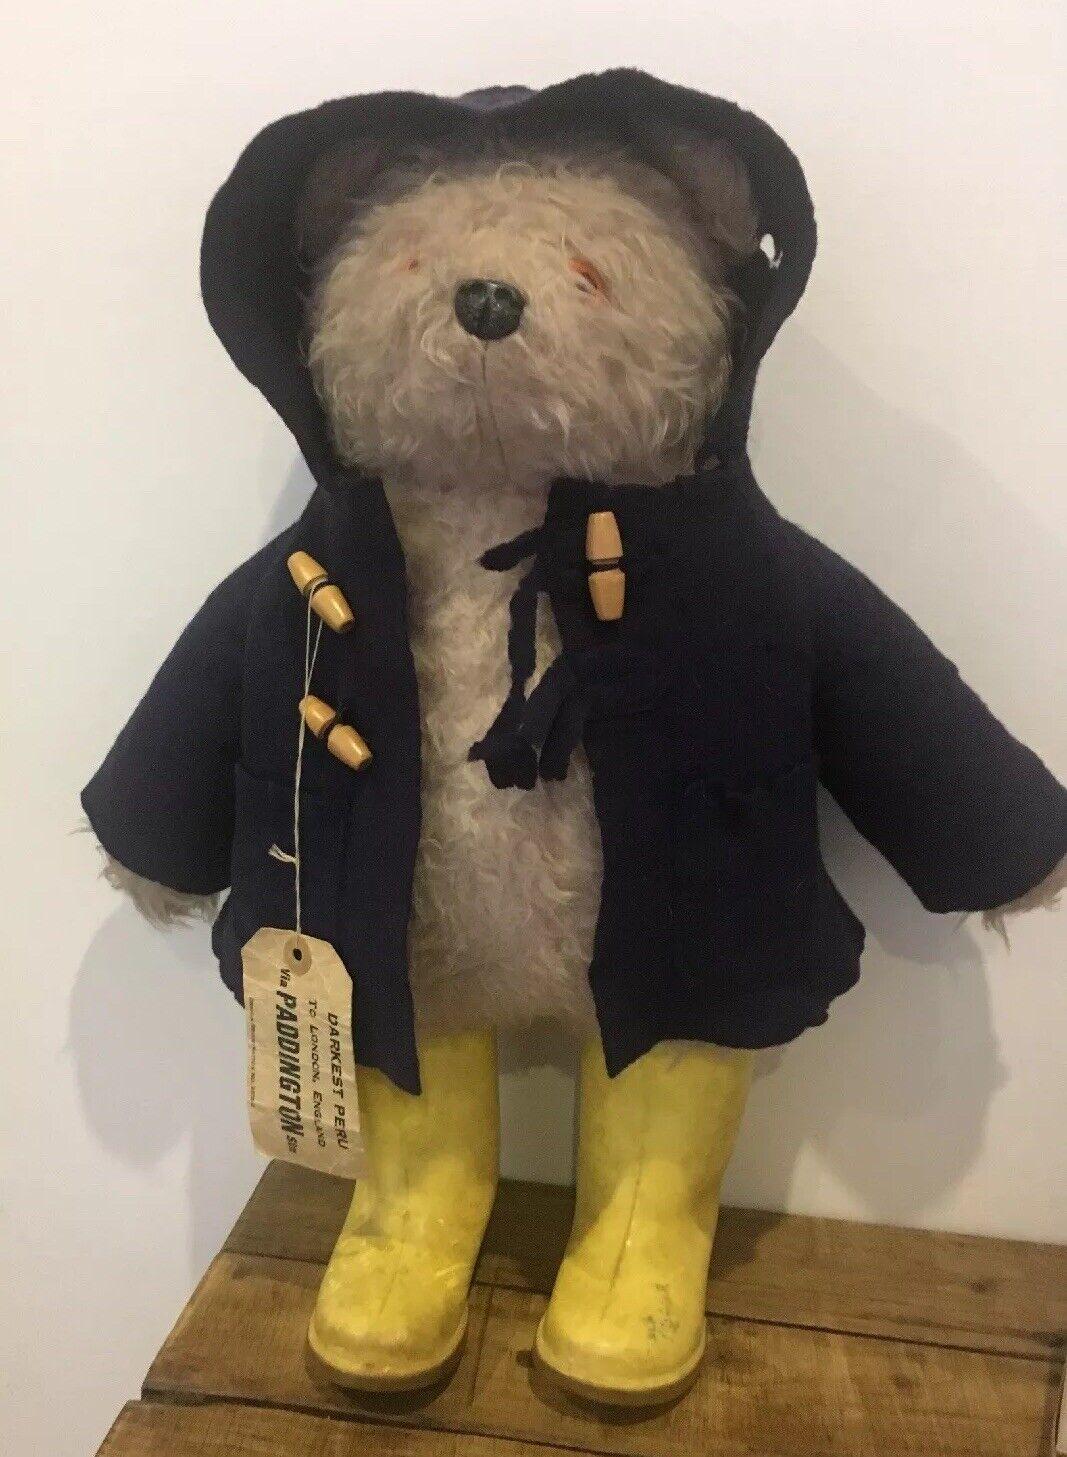 ORIGINALE VINTAGE GABRIELLE Paddington Bear Dunlop Stivali di gomma Mohair TAG N. 957892